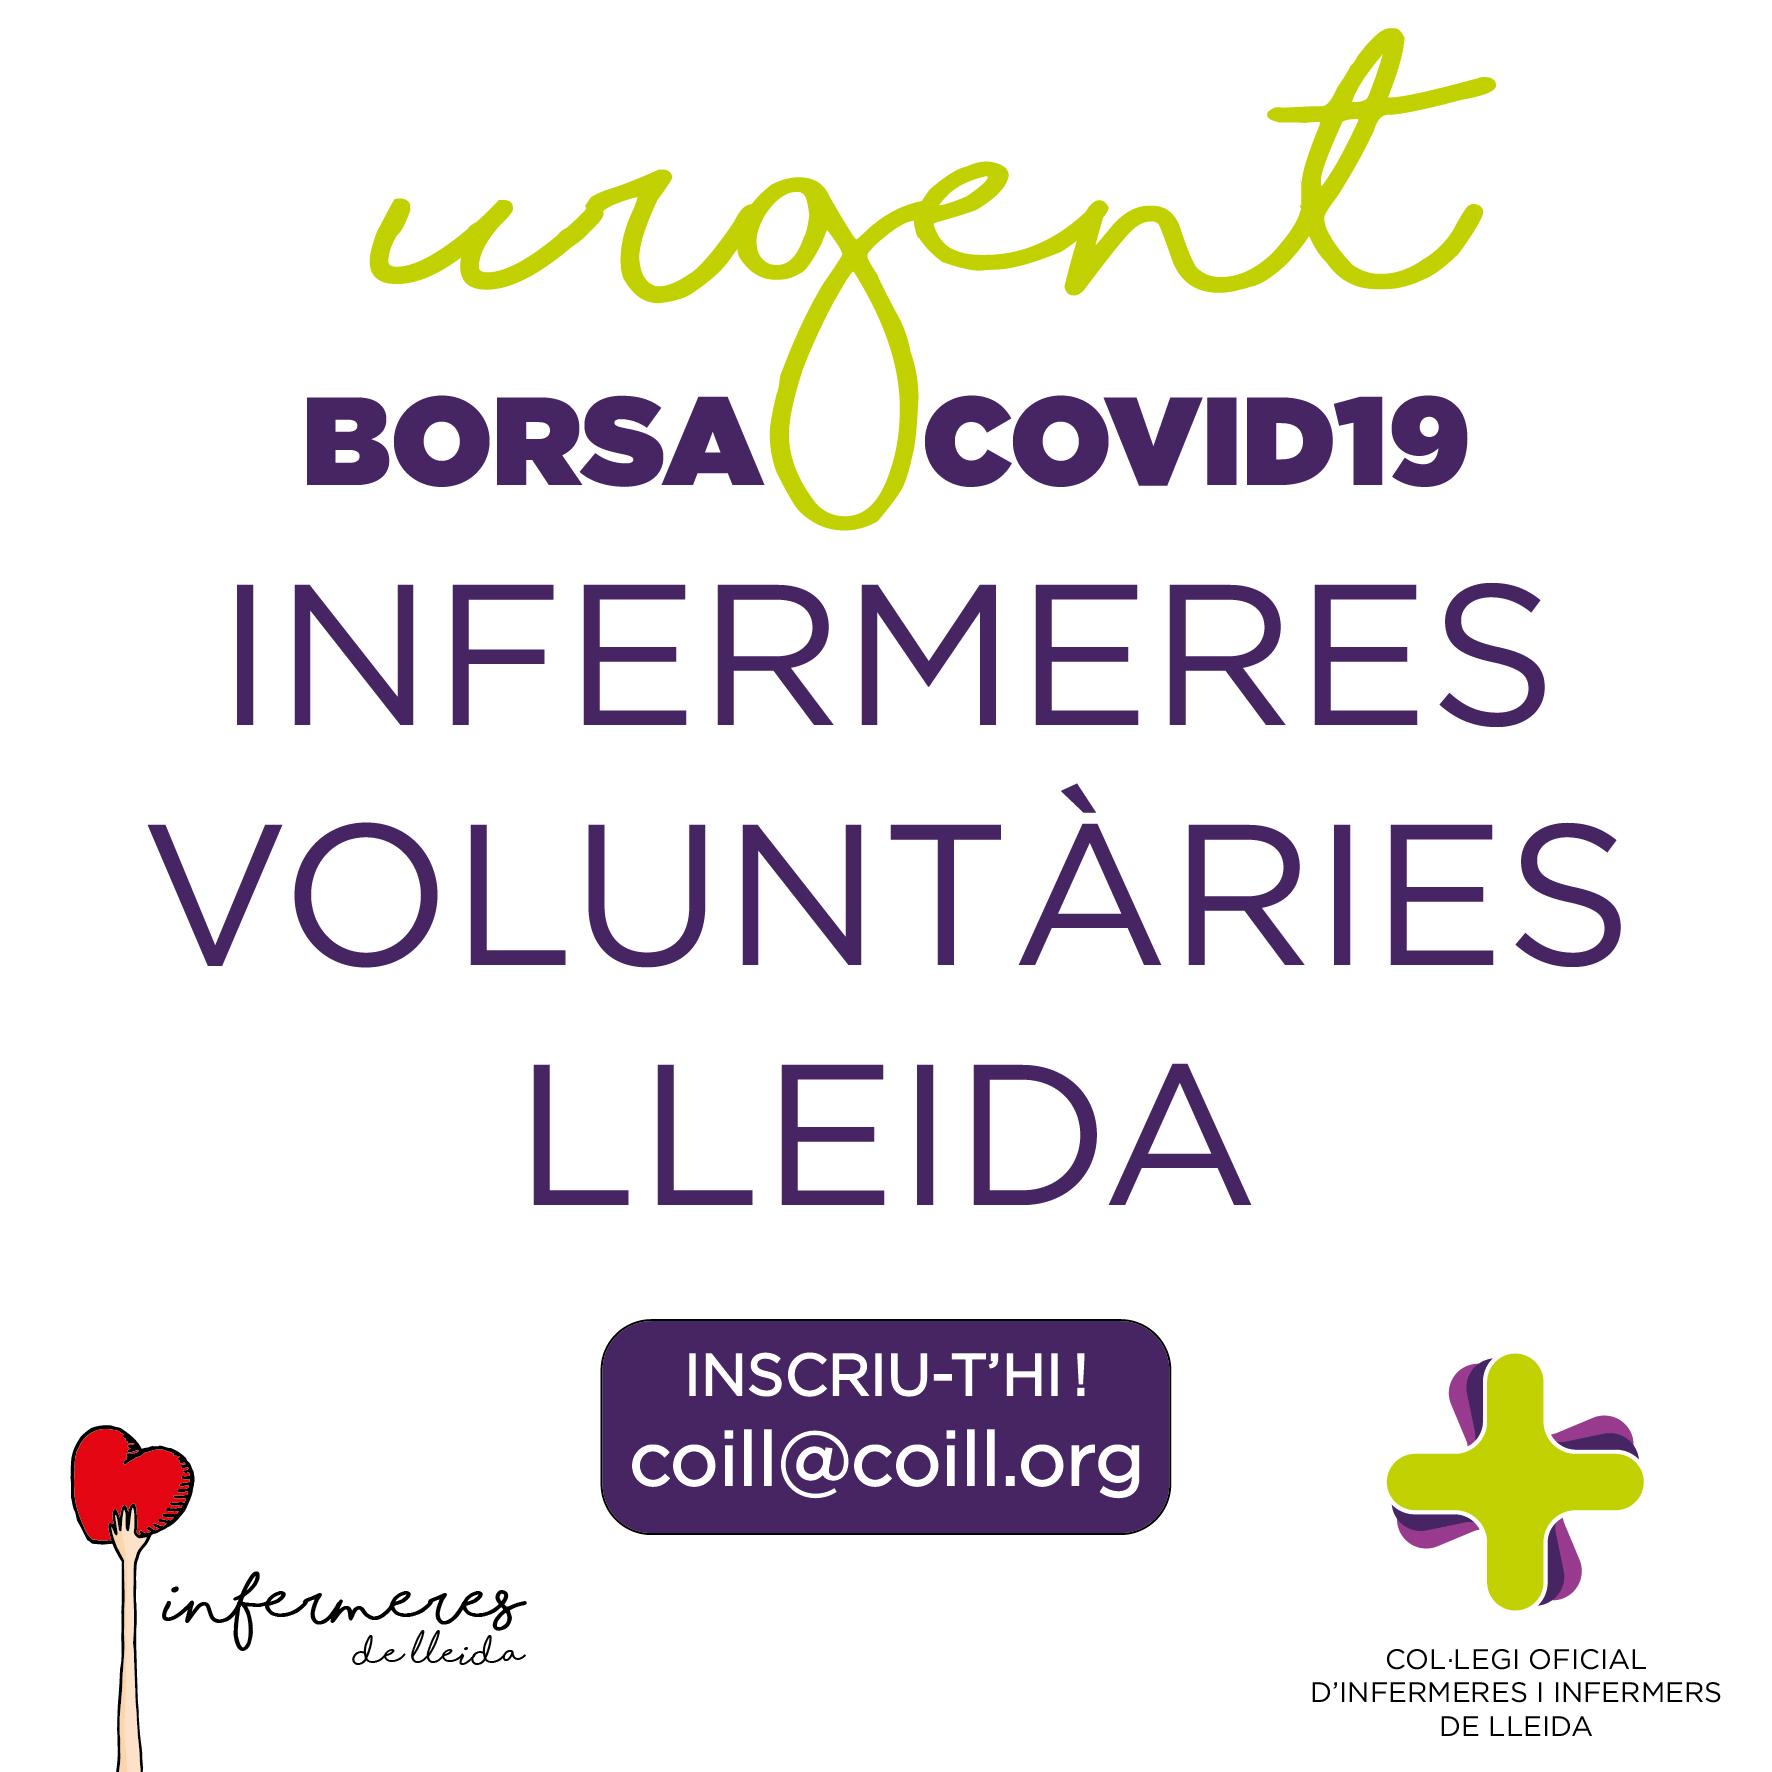 COILL-Borsa-Infermeres-Voluntaries-01